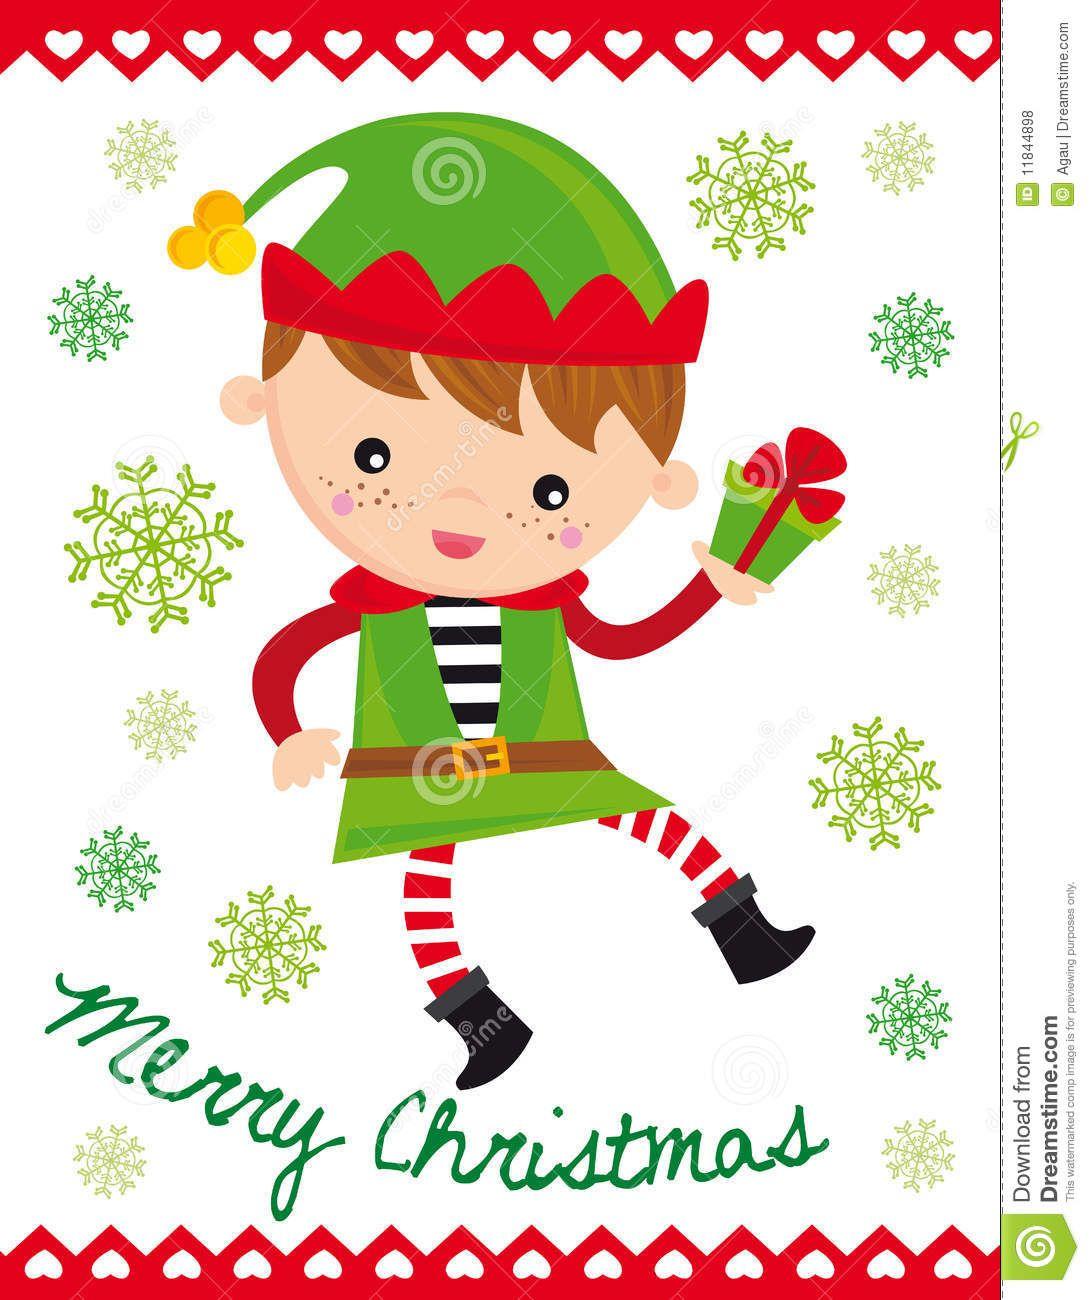 Christmas Humor Clip Art.Funny Elf Clip Art Illustration Of Funny Christmas Elf